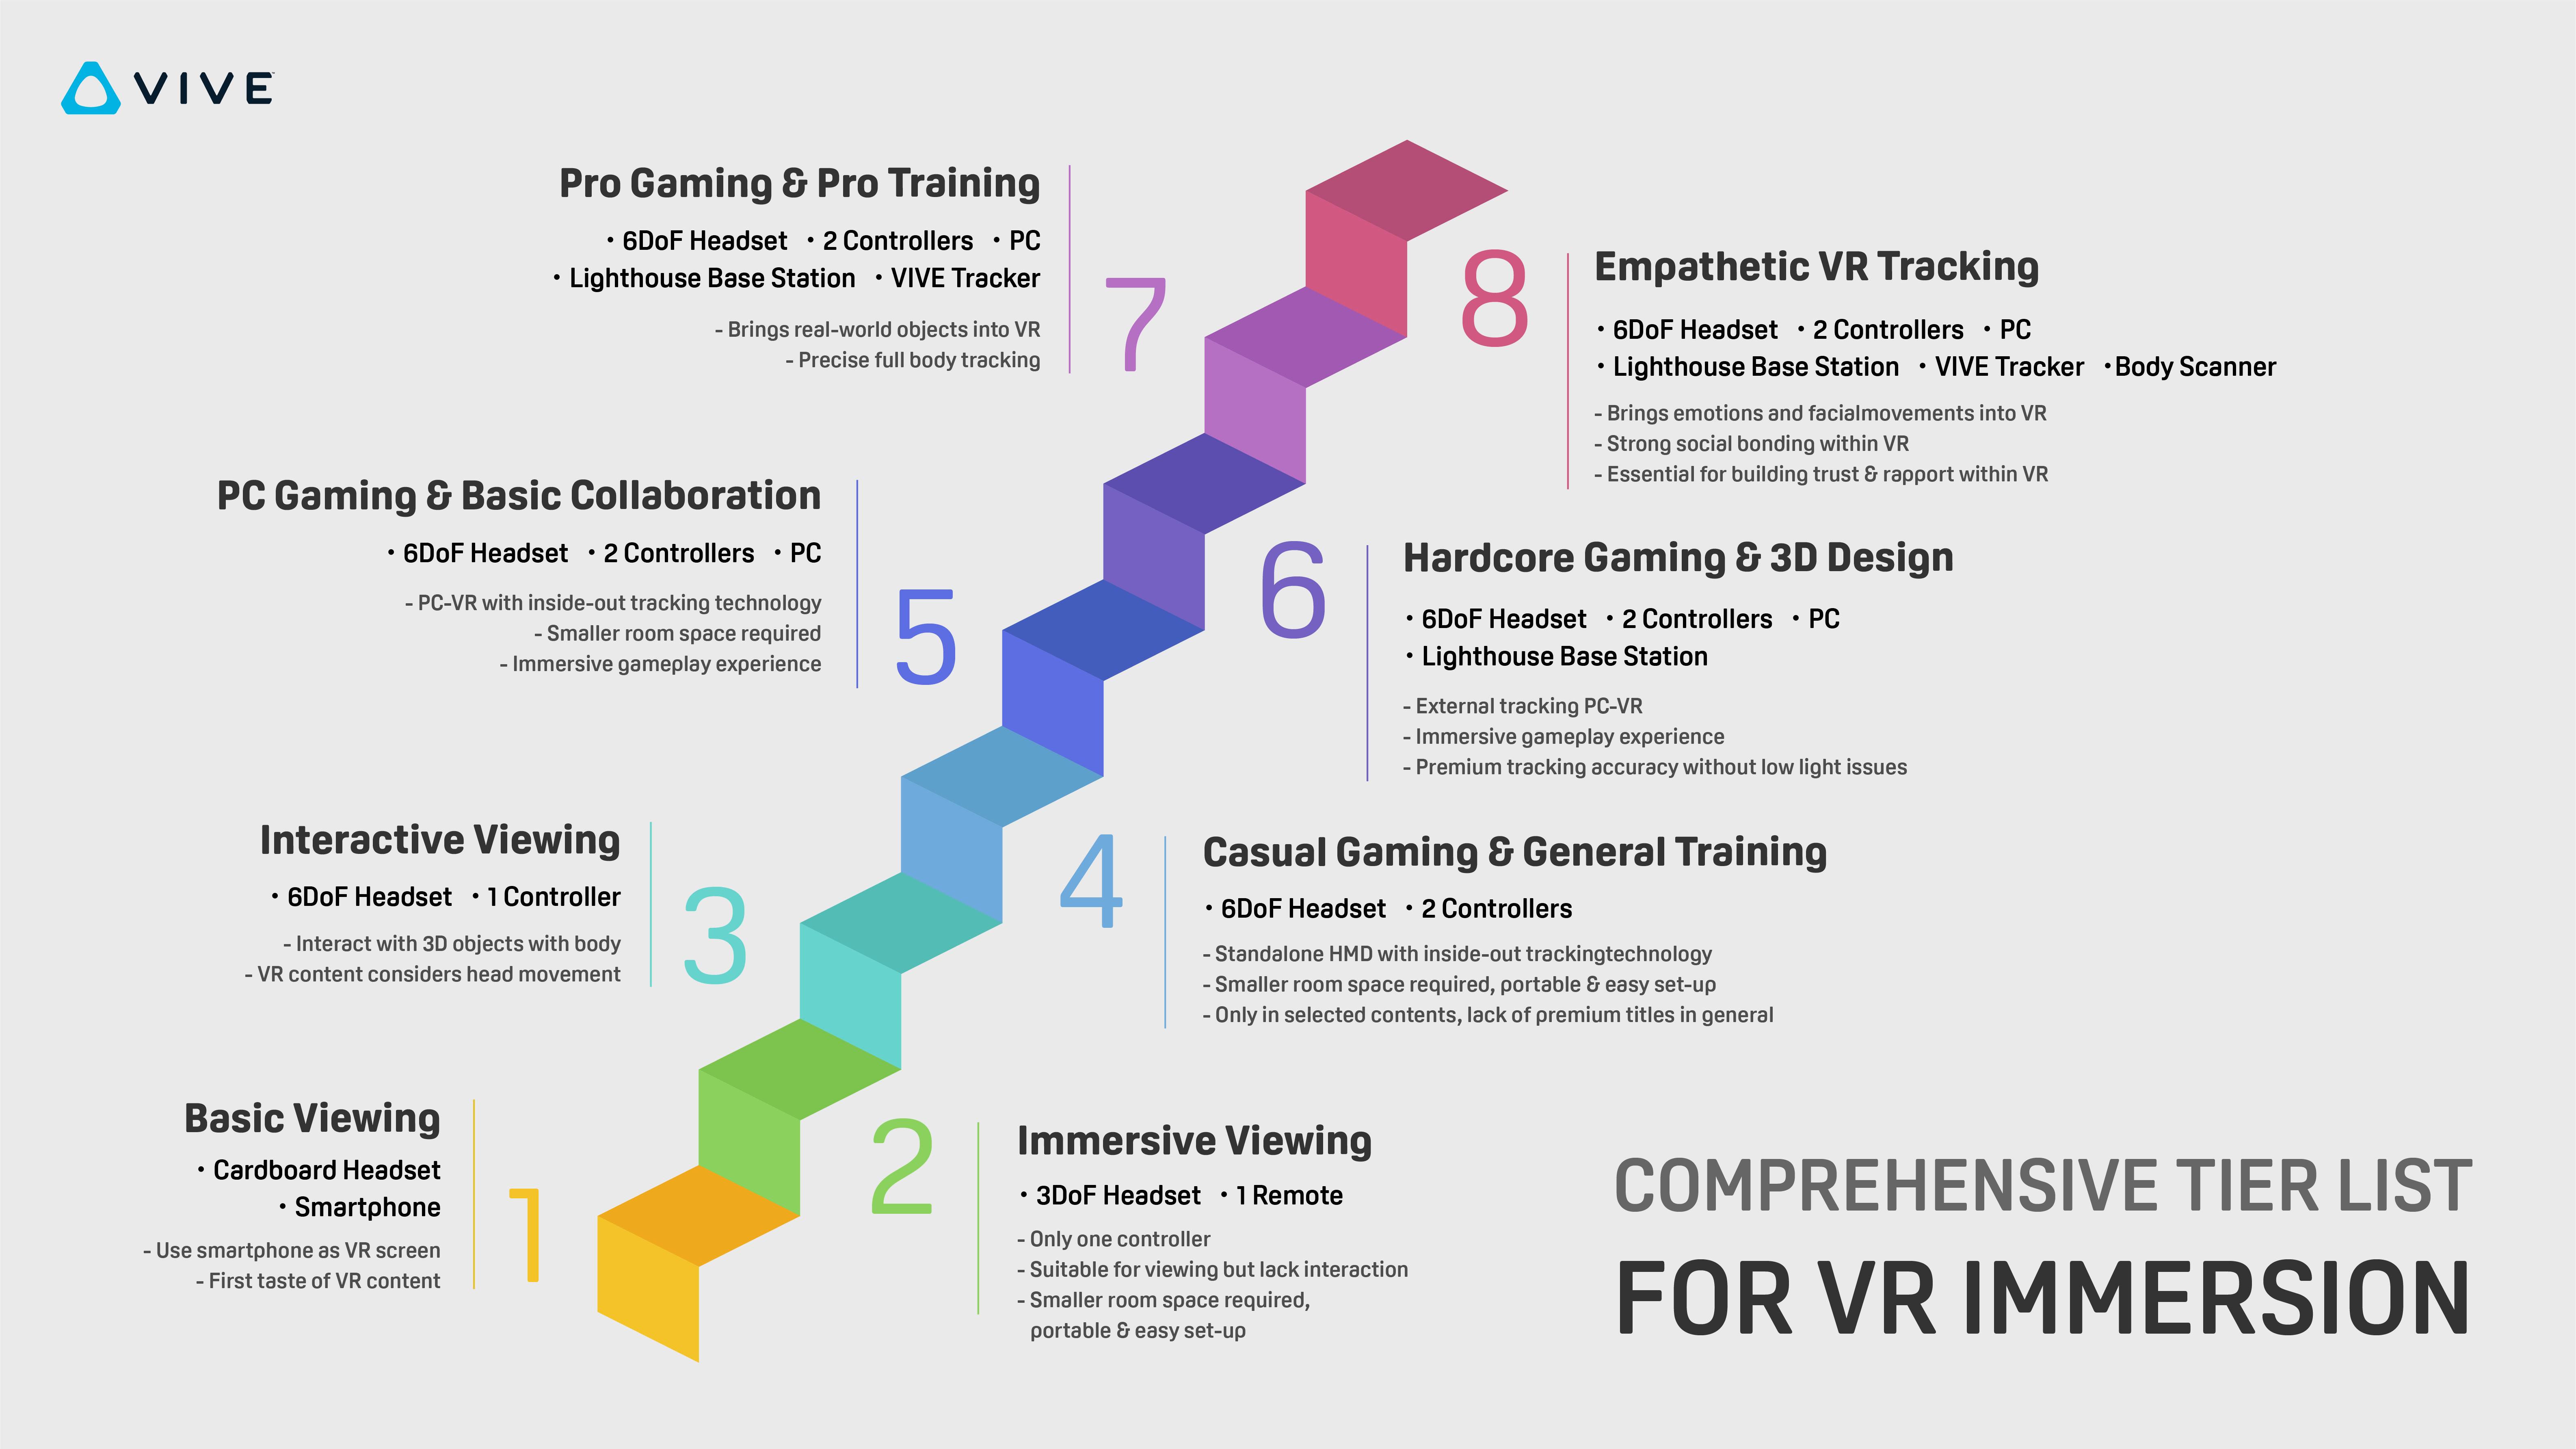 VR Immersion Tier List